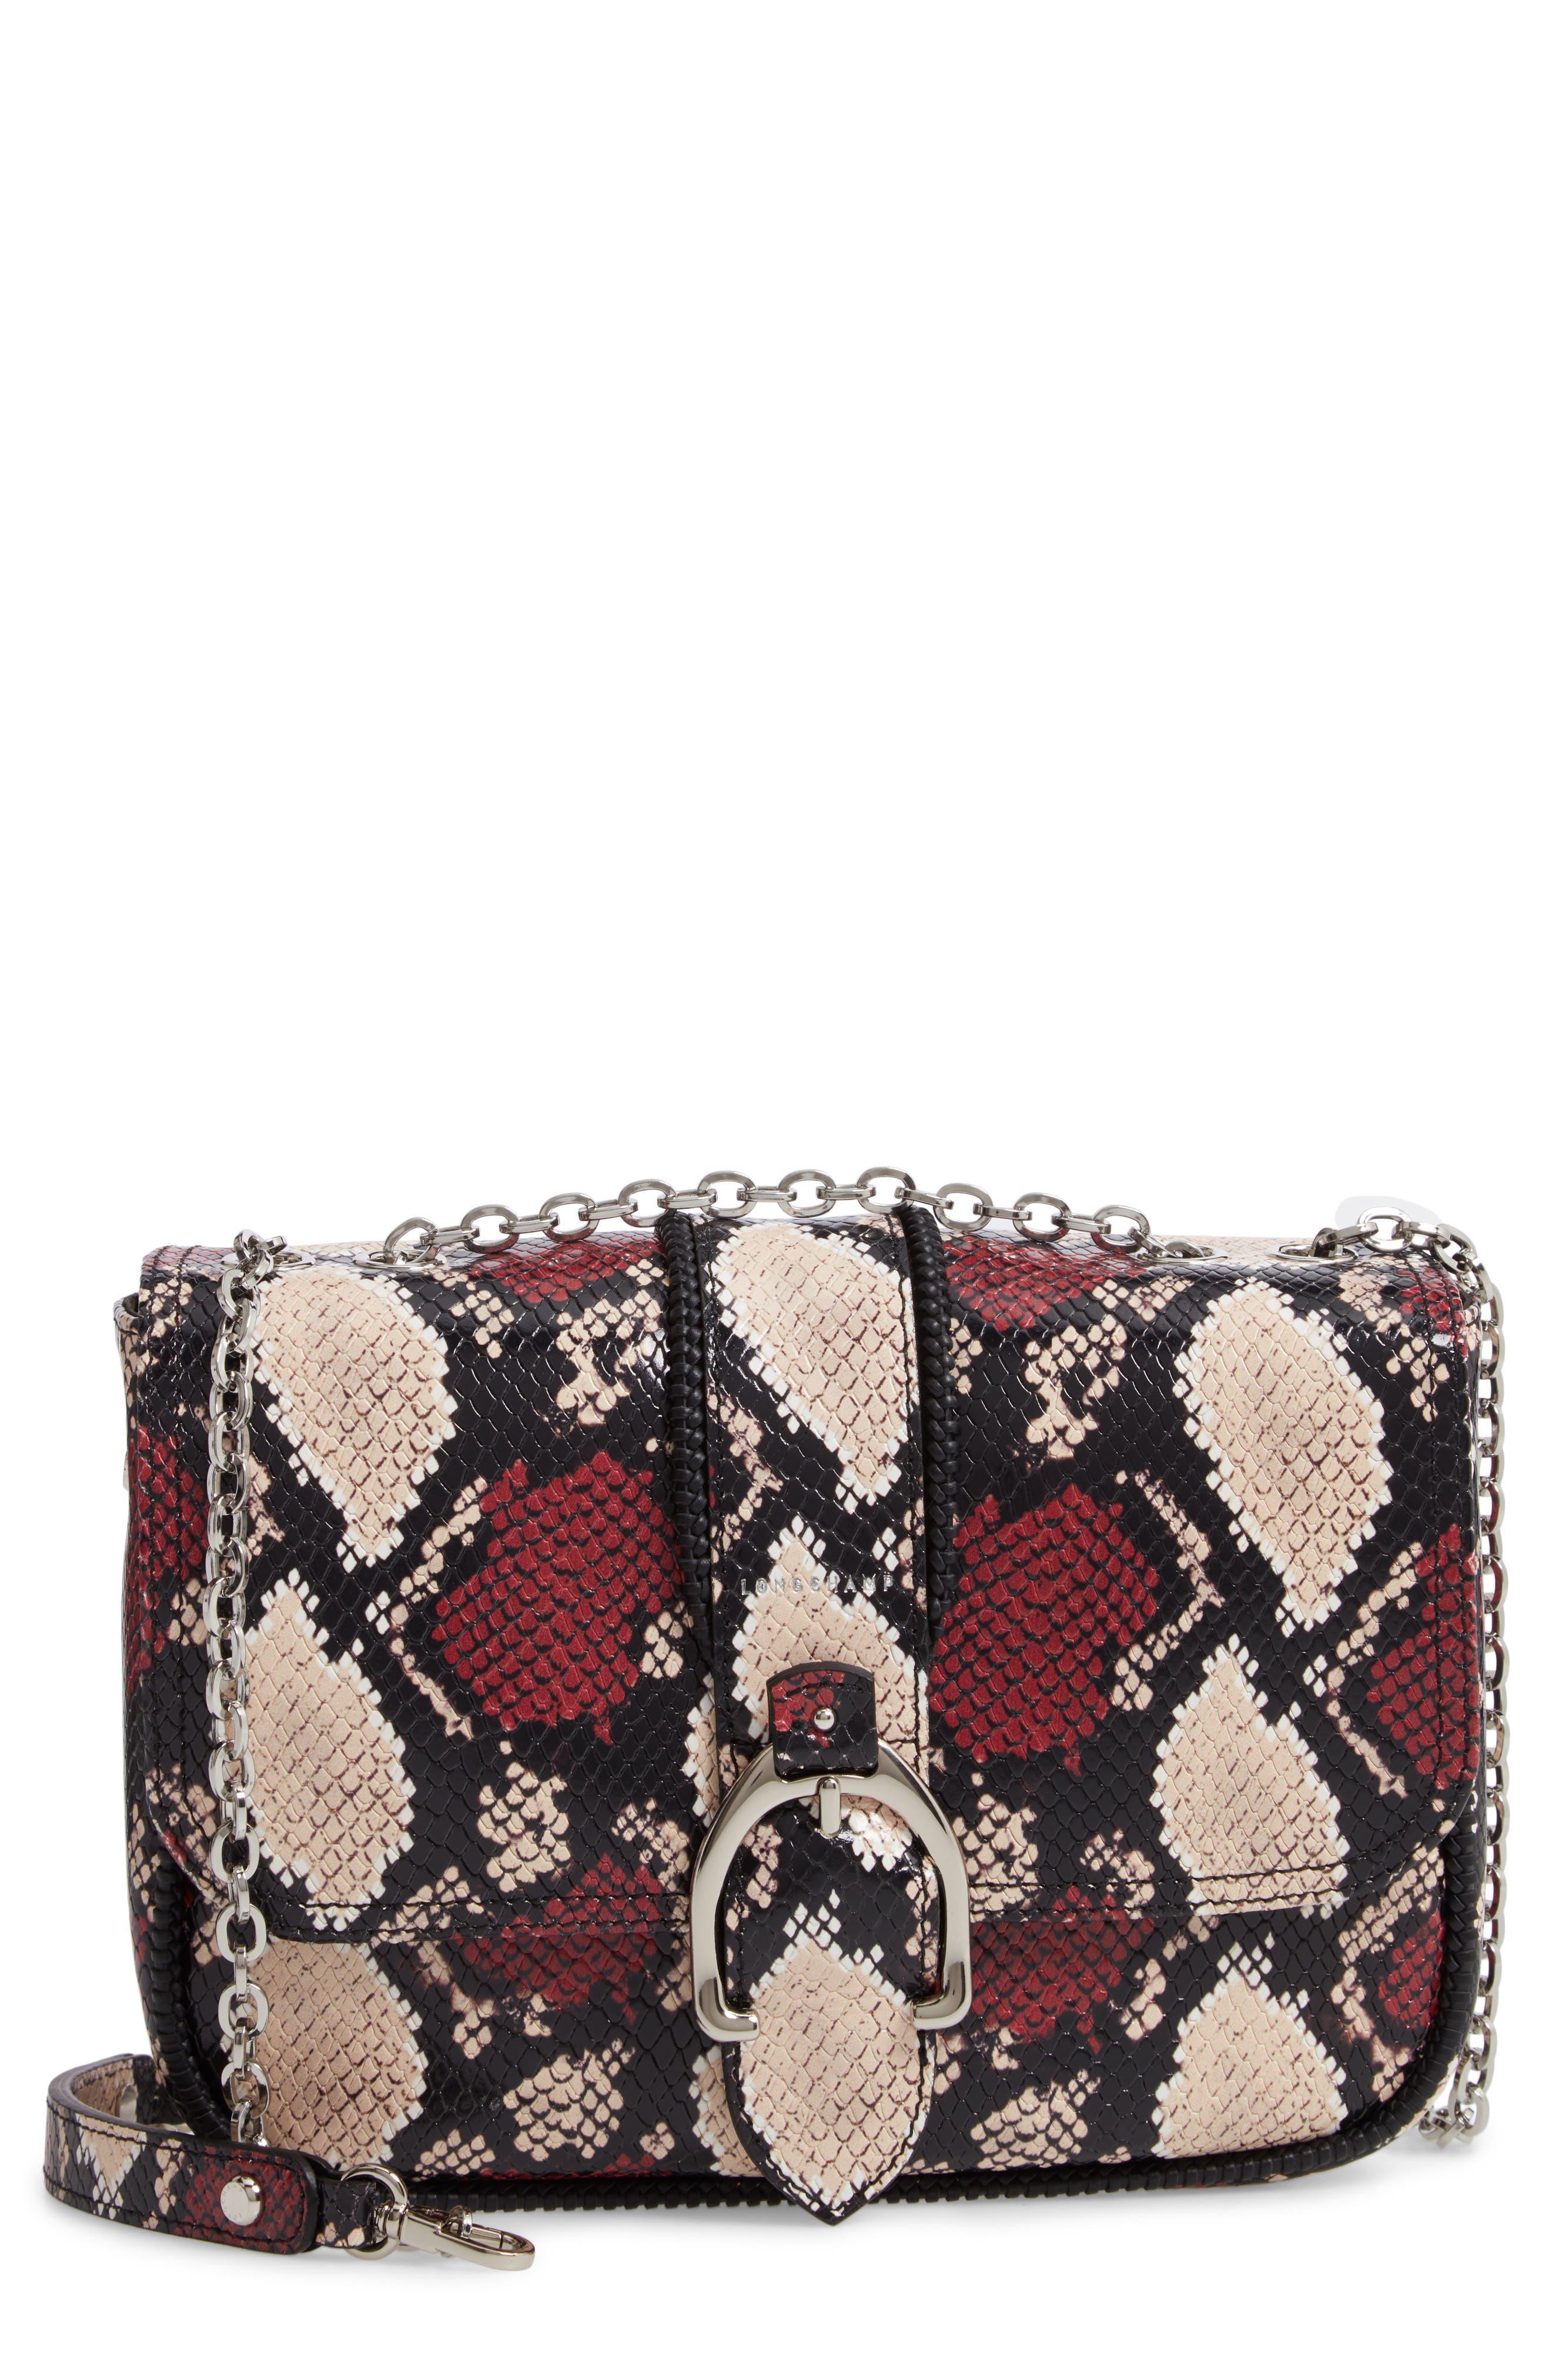 495c550b4 New Markdowns Women's Crossbody Bags   Nordstrom